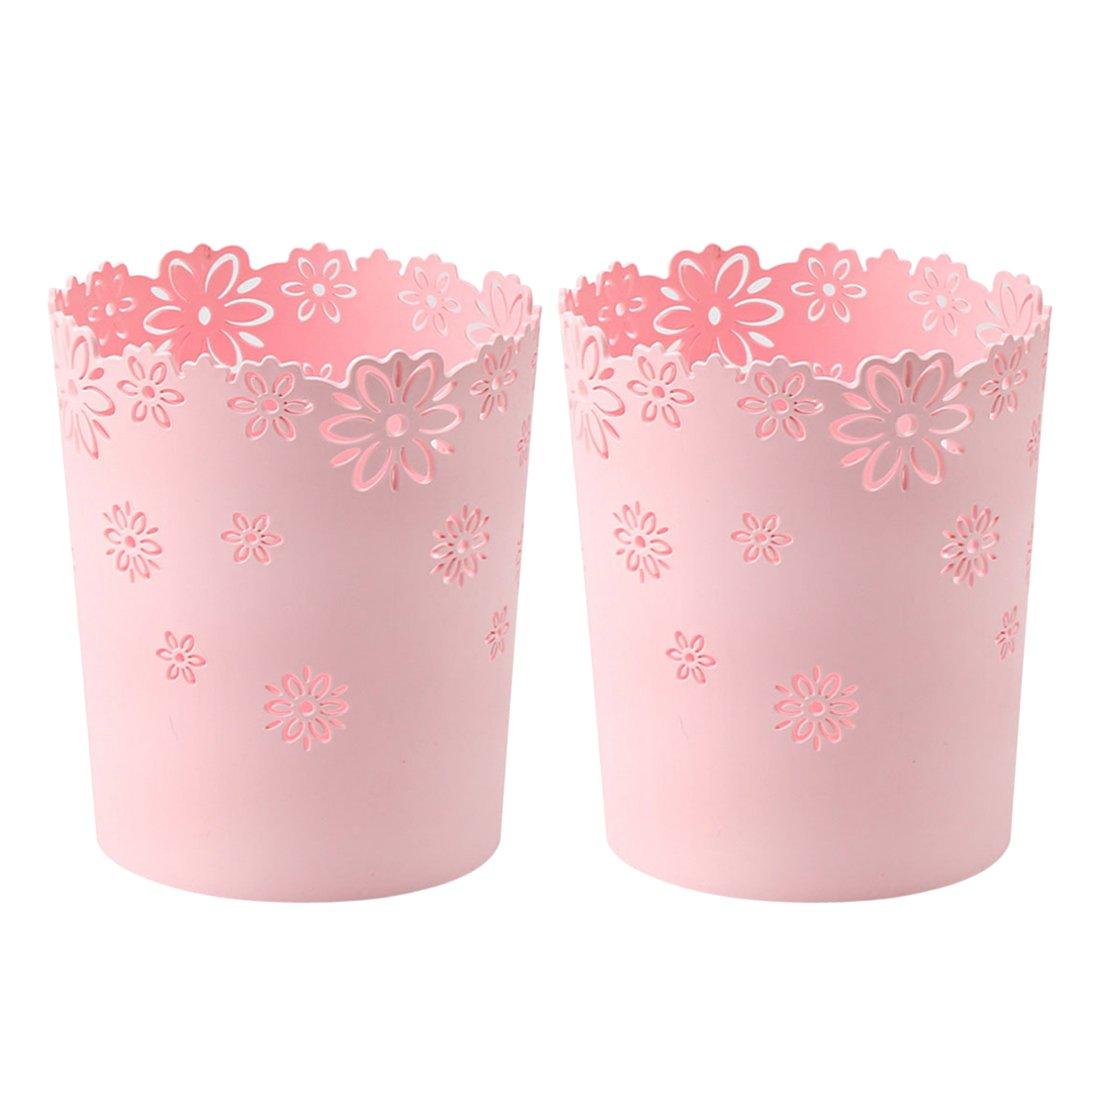 Waste Paper Baskets, XSHION Trash Can Garbage Bin Plastic without Lid for Bedroom /Kitchen /Bathroom /Office /Desktop (Pink 2 Pack)